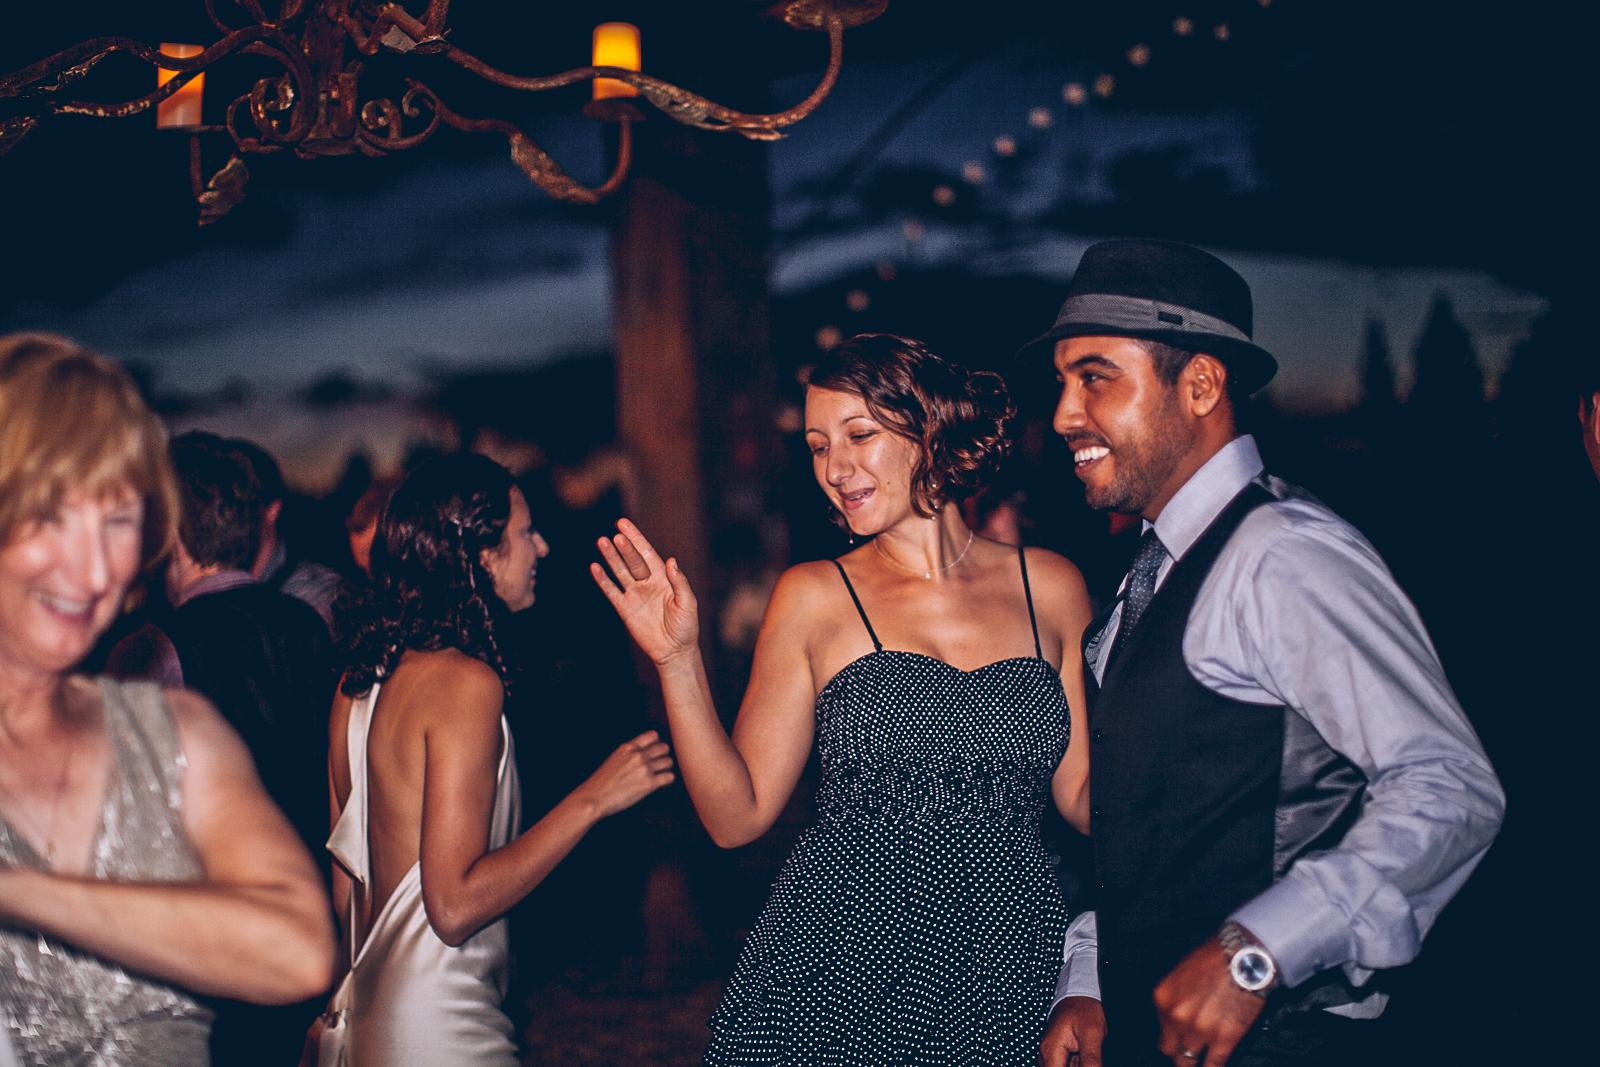 miraflores_winery_wedding_photography_ian_melissa_ebony_siovhan_bokeh_photography_77.jpg